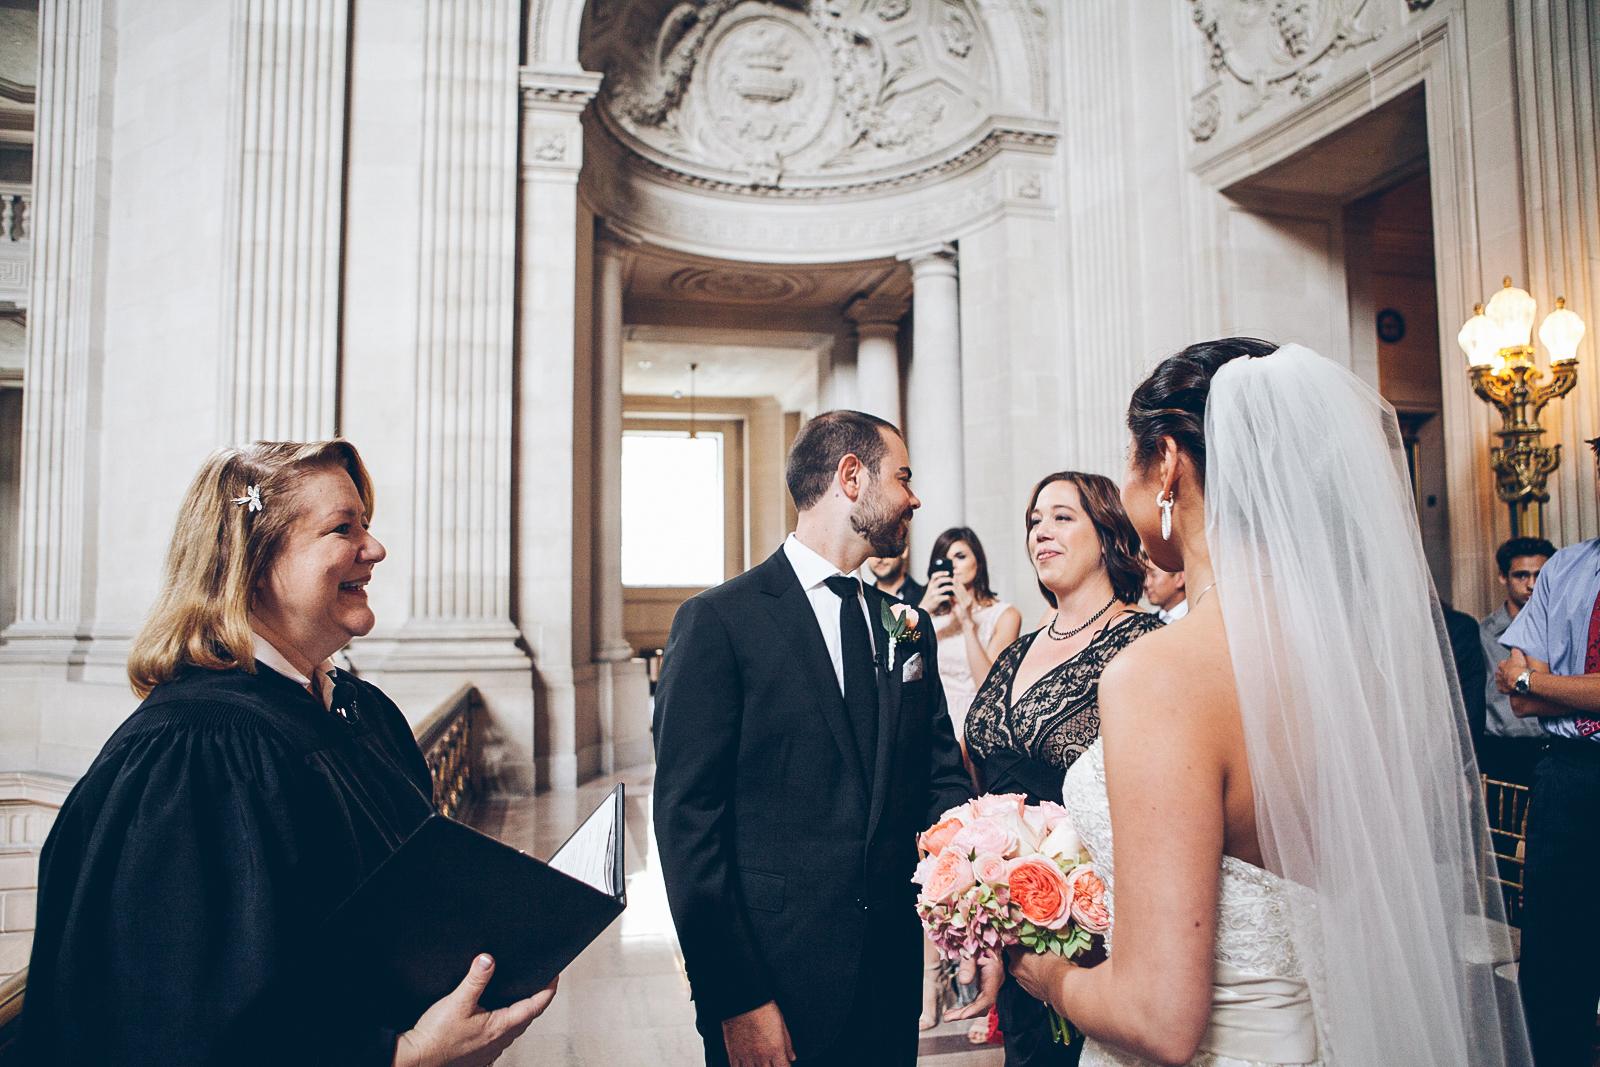 San_francisco_city_hall_wedding_photography_meegan_travis_ebony_siovhan_bokeh_photography_11.jpg